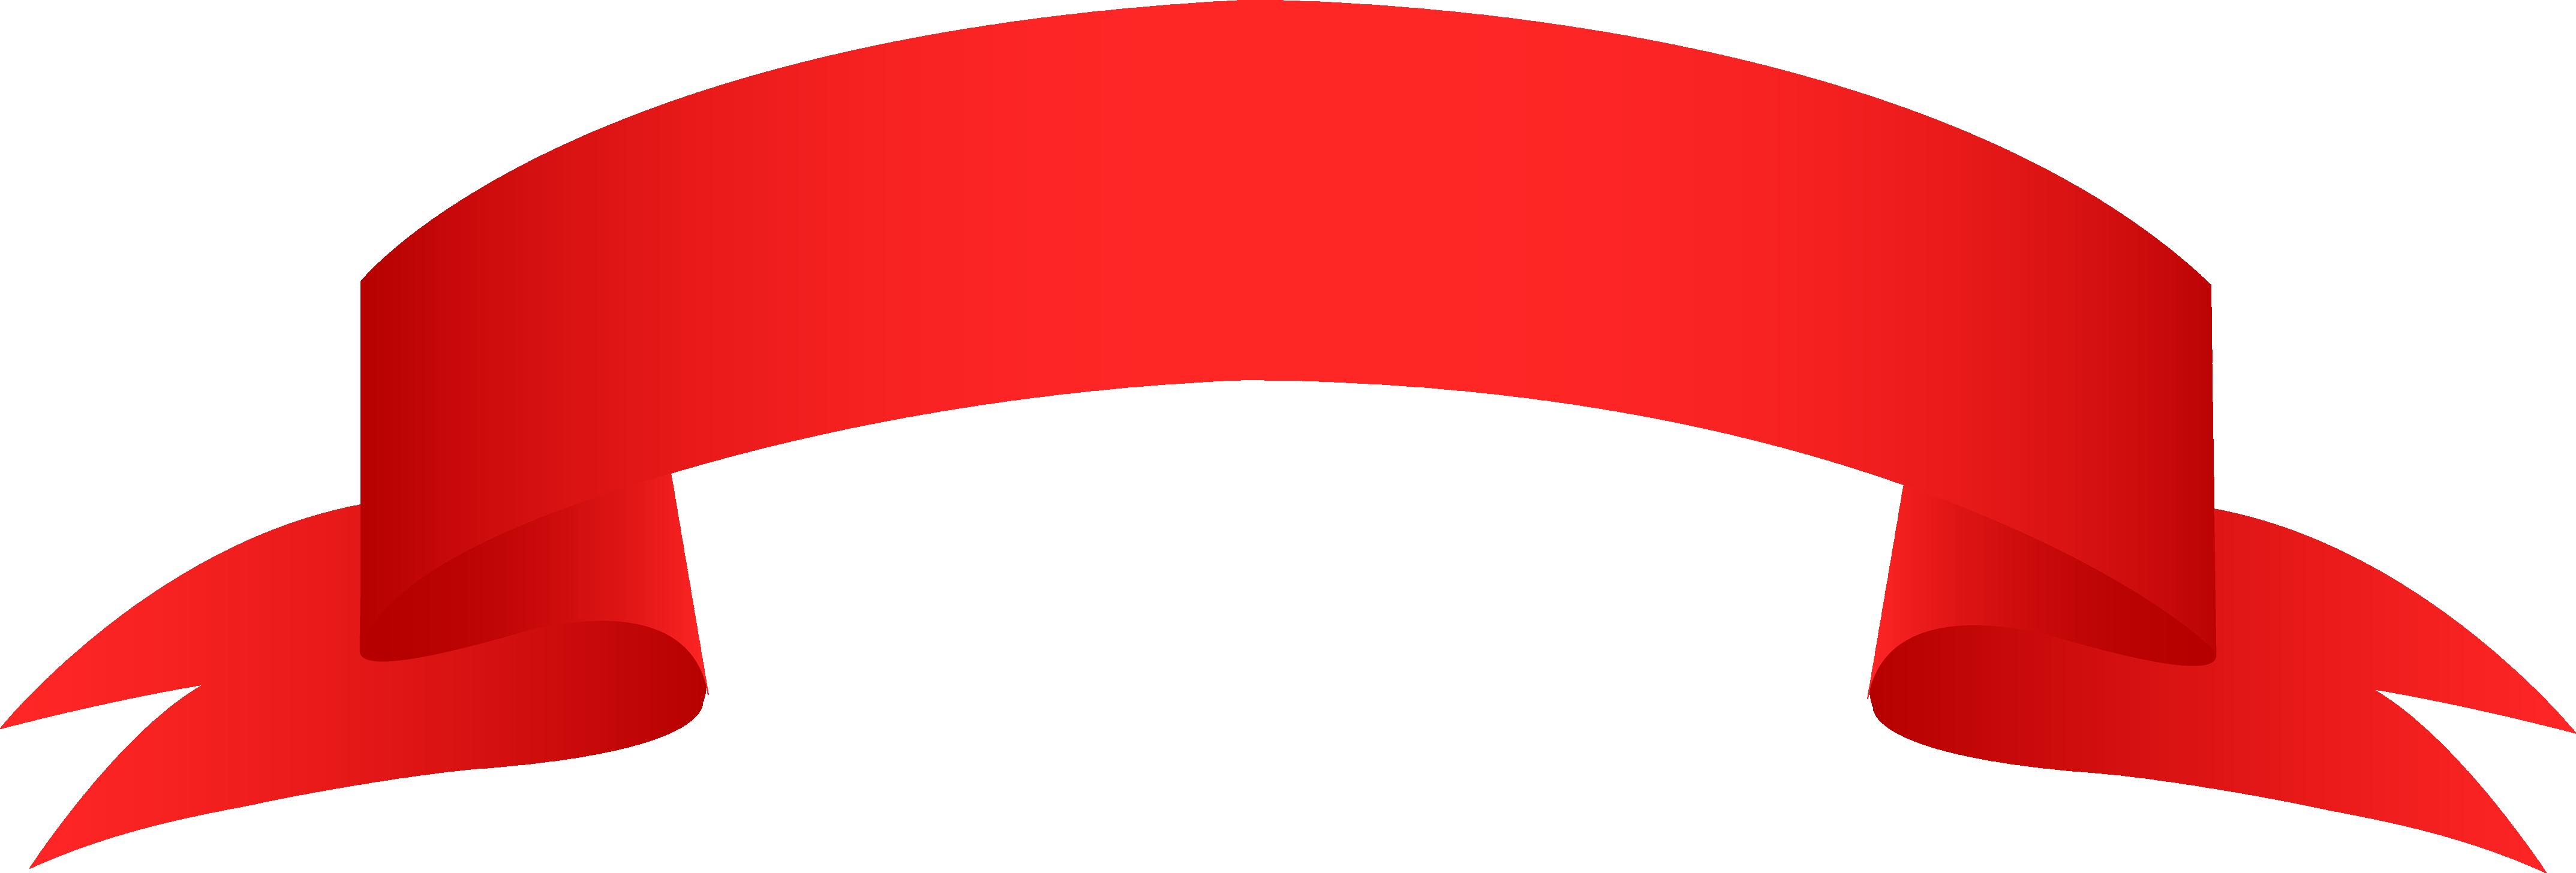 Logo ribbon clipart svg Logo clipart ribbon, Logo ribbon Transparent FREE for ... svg